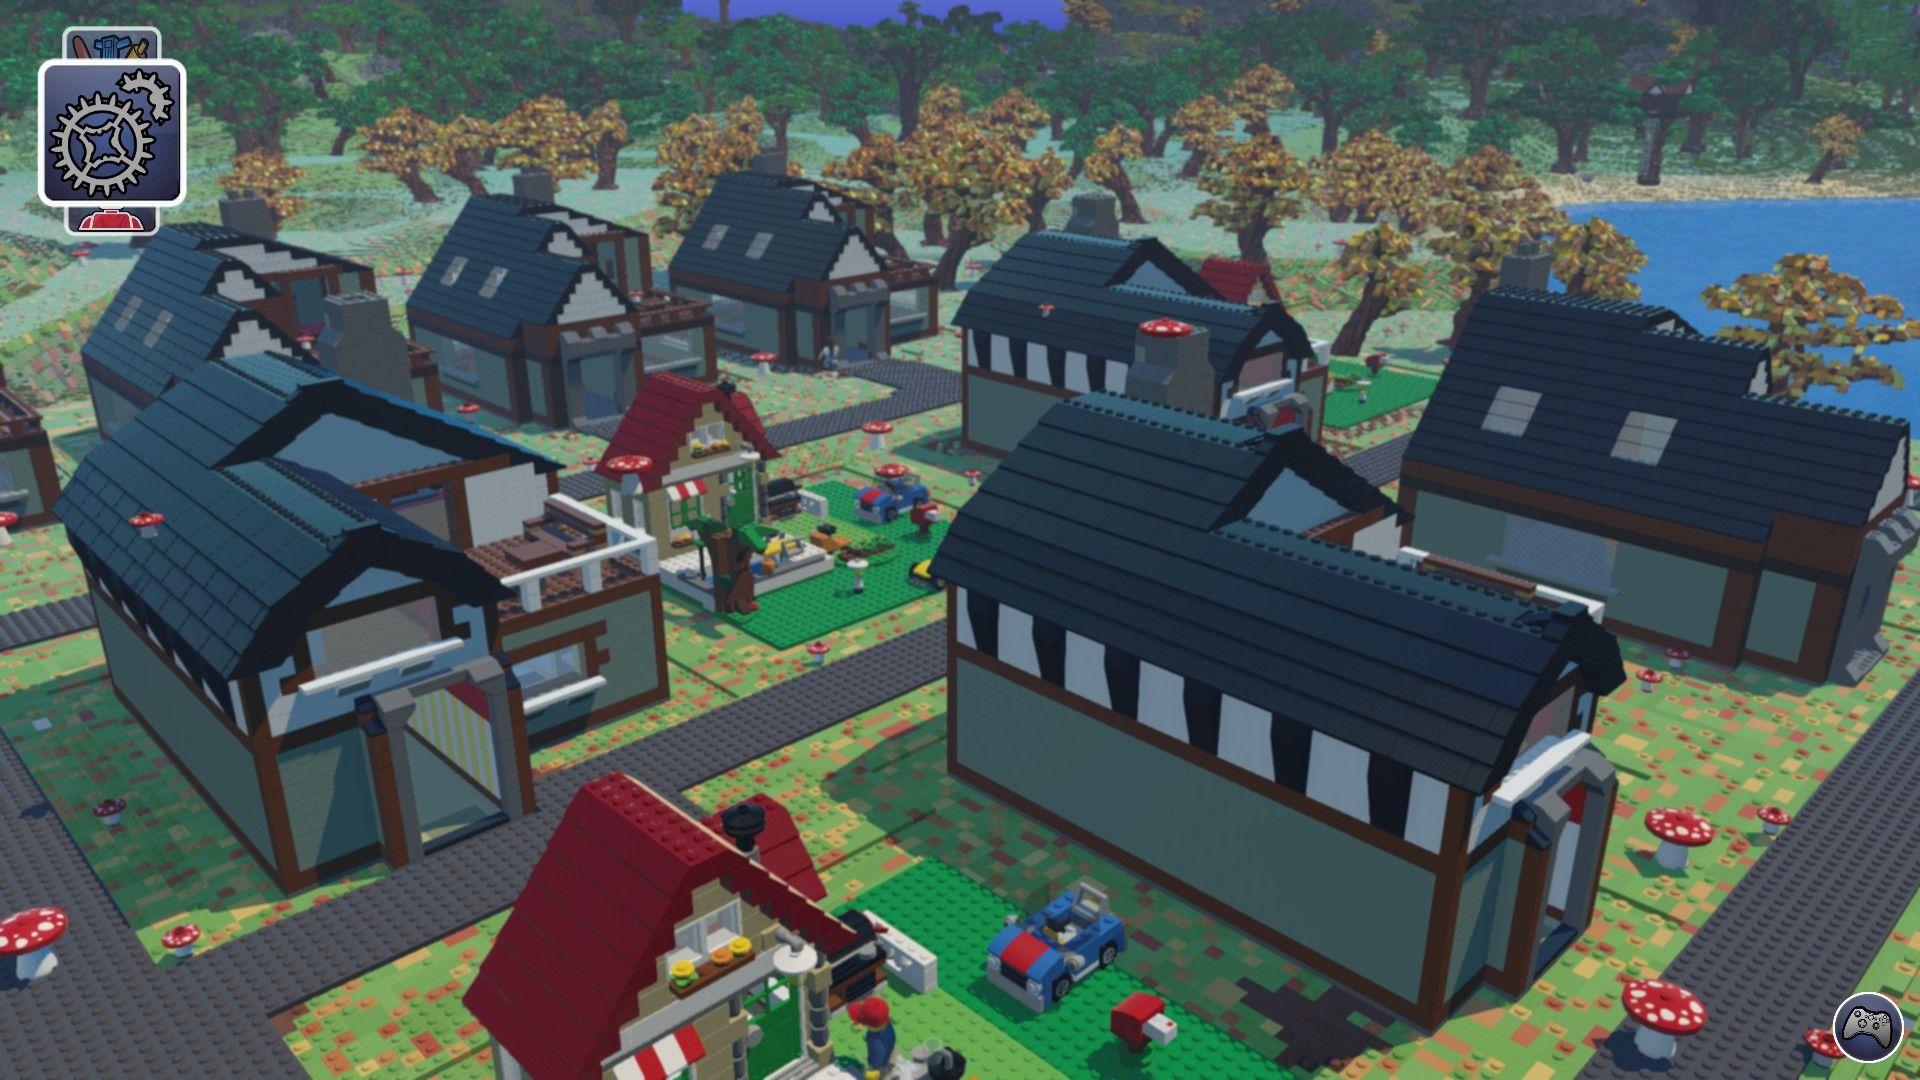 LEGO Worlds (Nintendo Switch) - 4